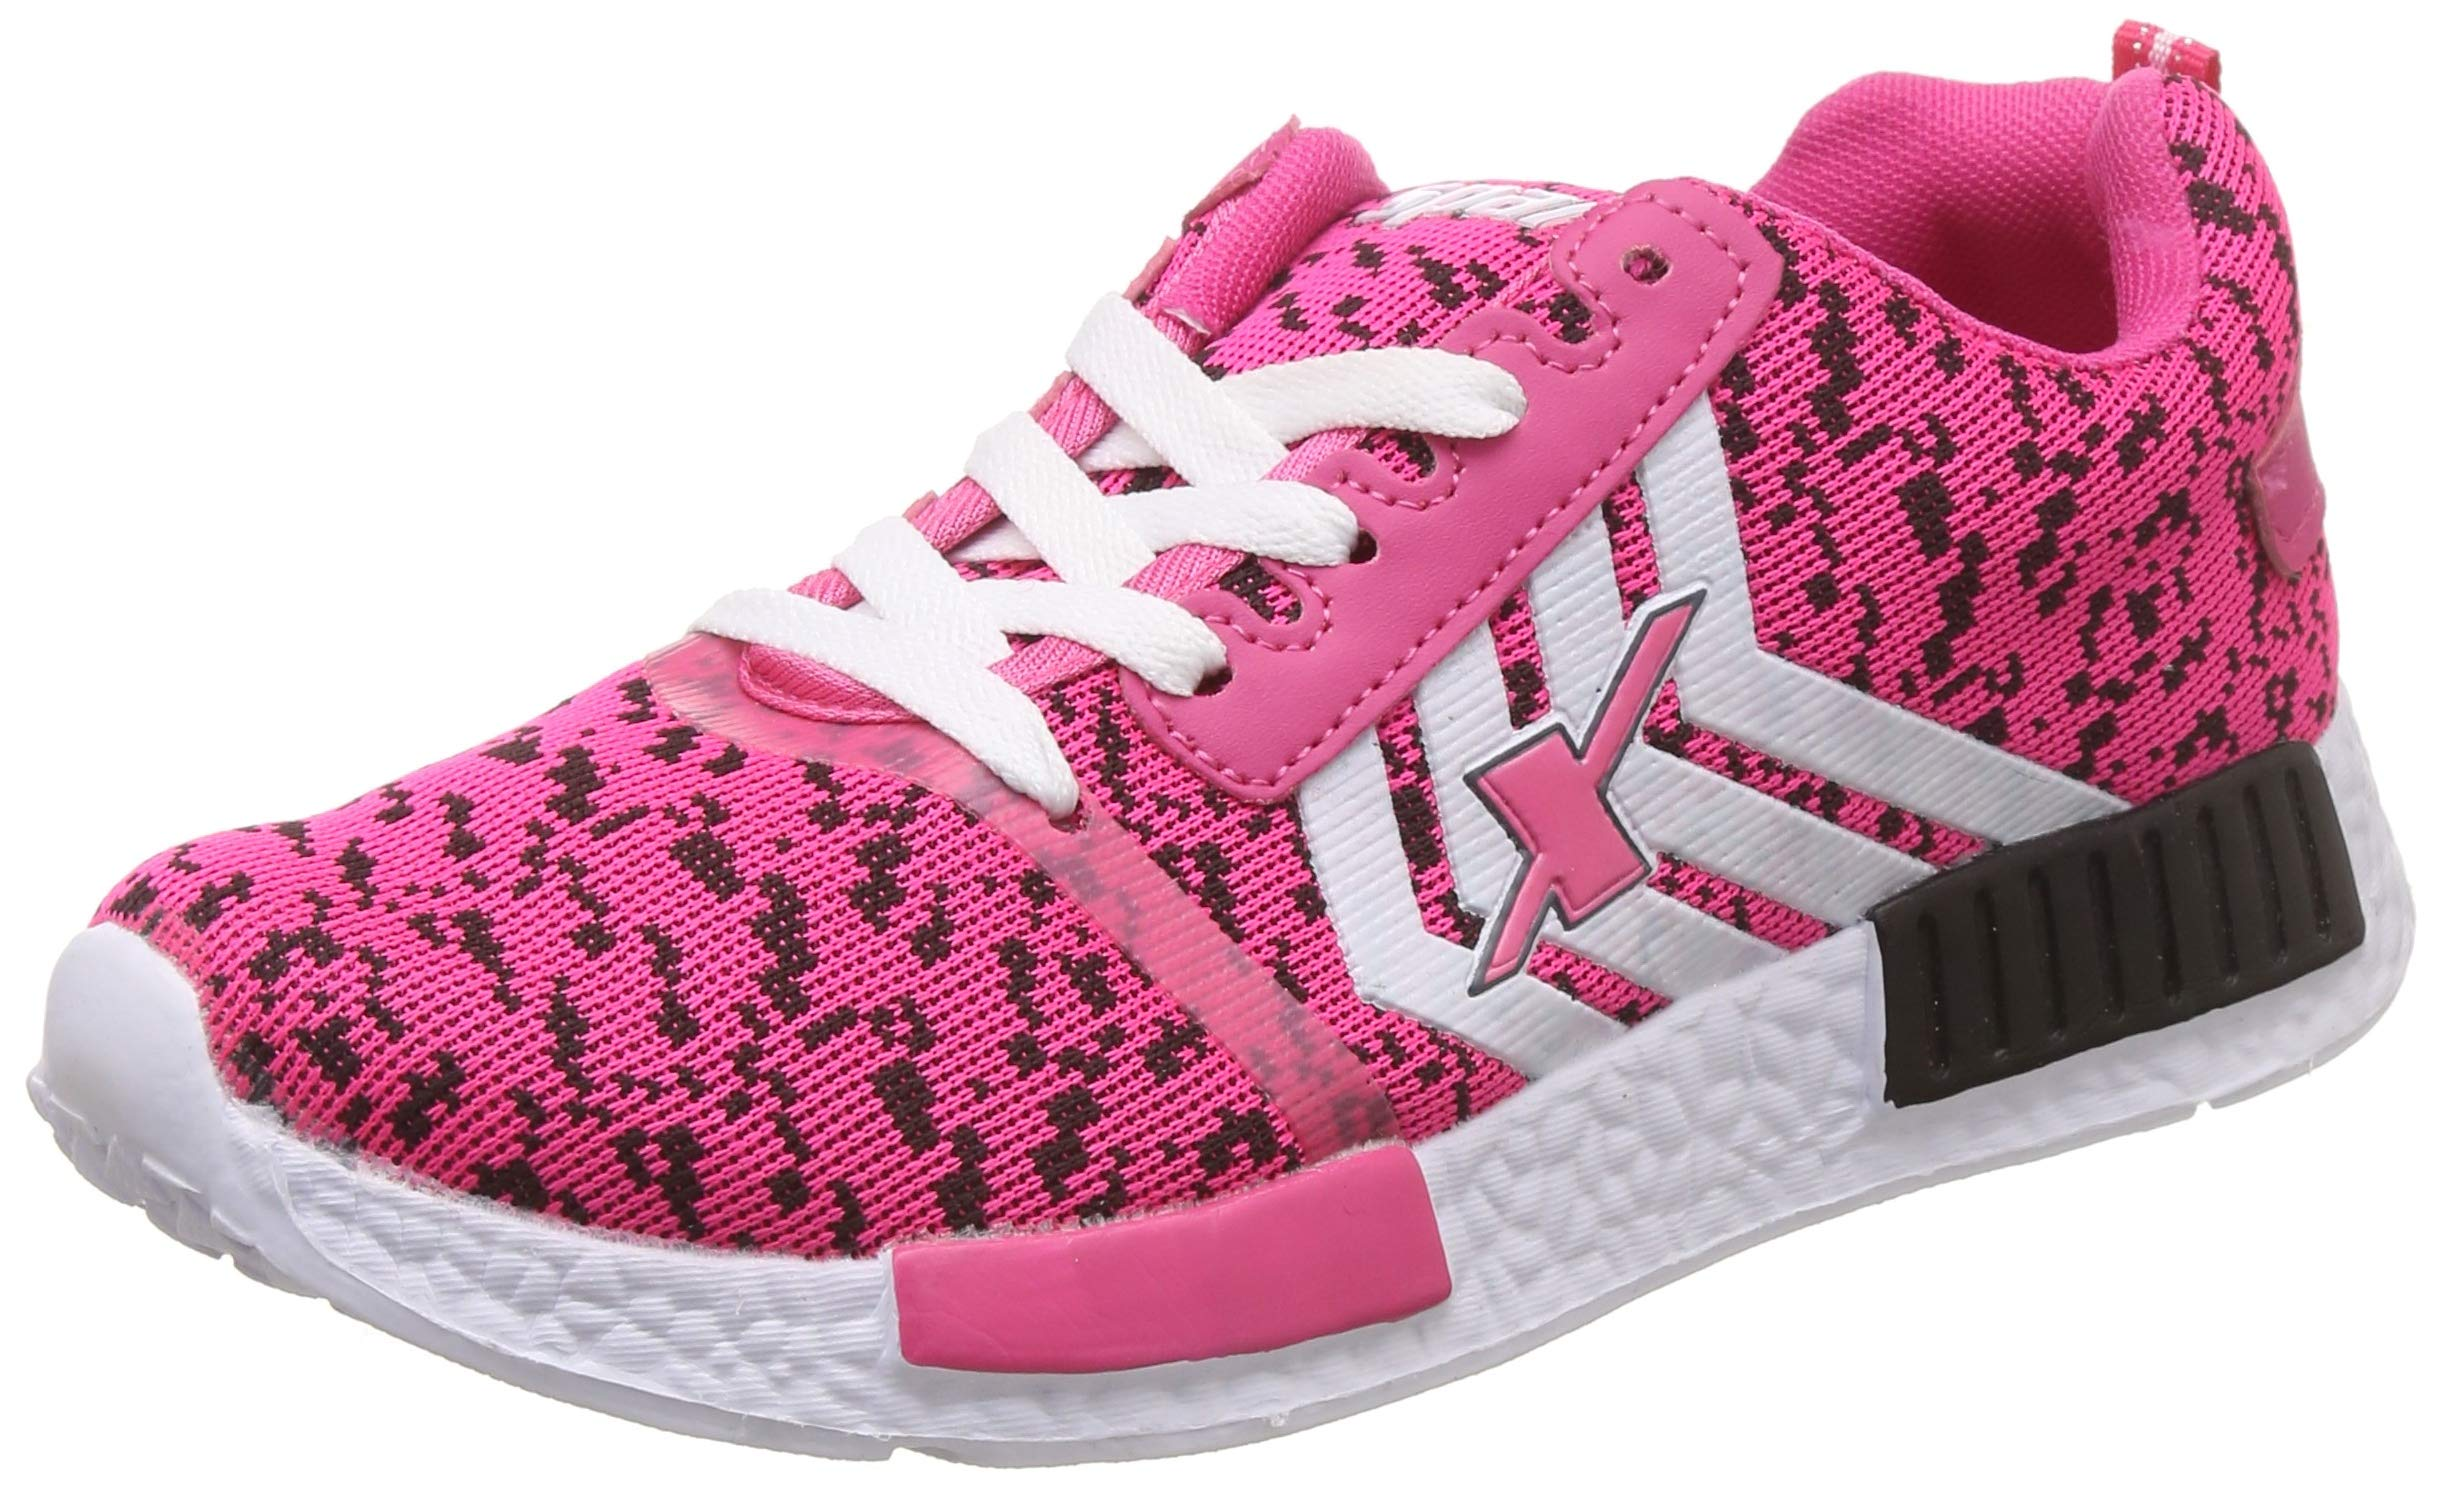 Sparx Women's Running Shoes- Buy Online